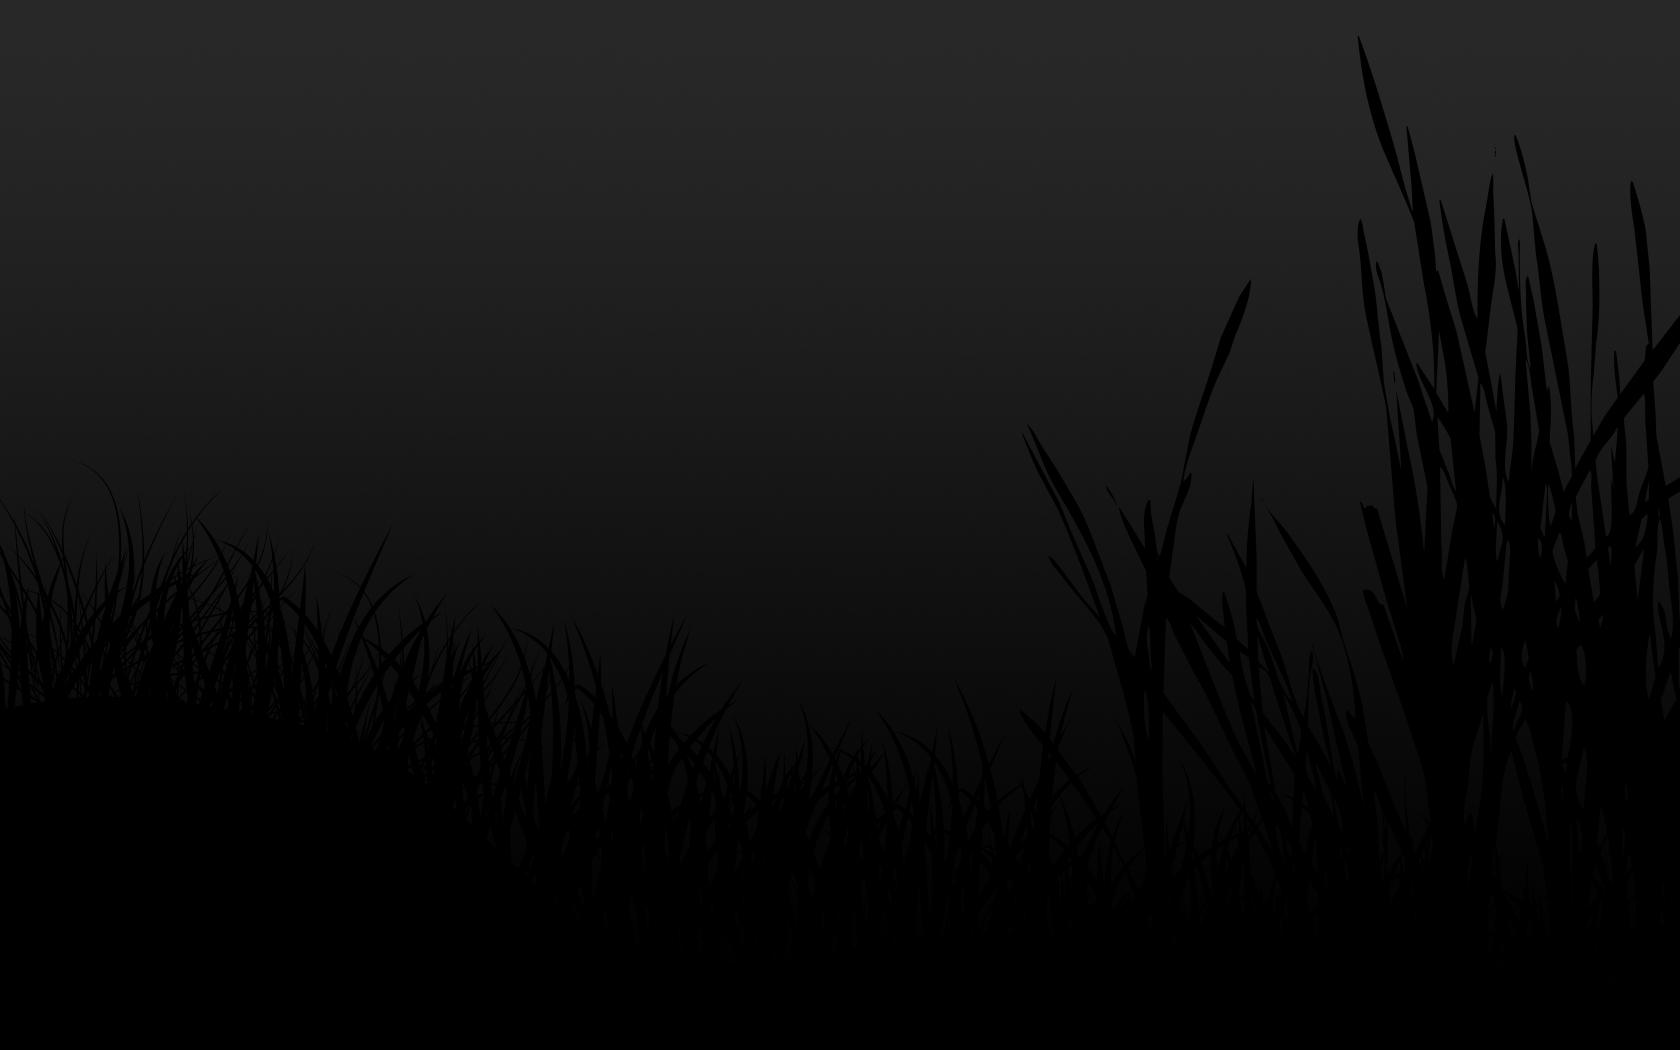 Download Black Wallpaper HD Dekstop Download Black Wallpaper 1680x1050